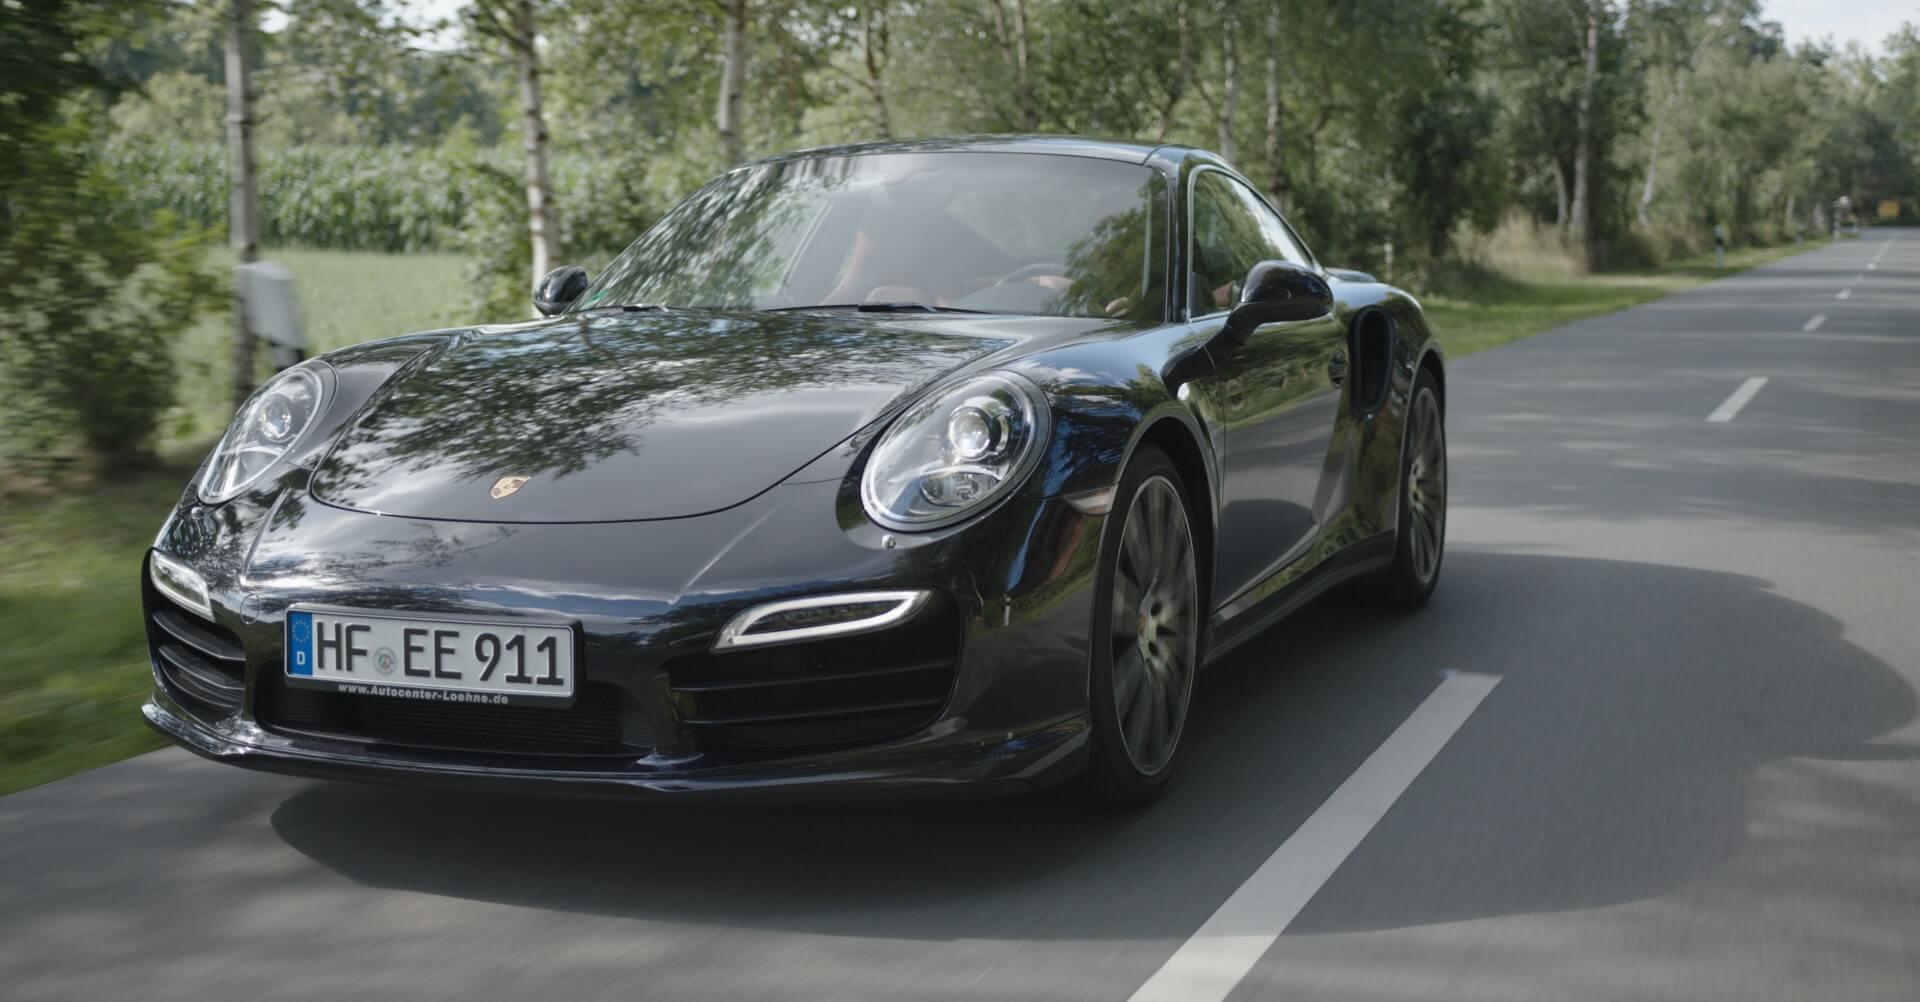 porsche 911 turbo kaufen fahrzeugb rse. Black Bedroom Furniture Sets. Home Design Ideas